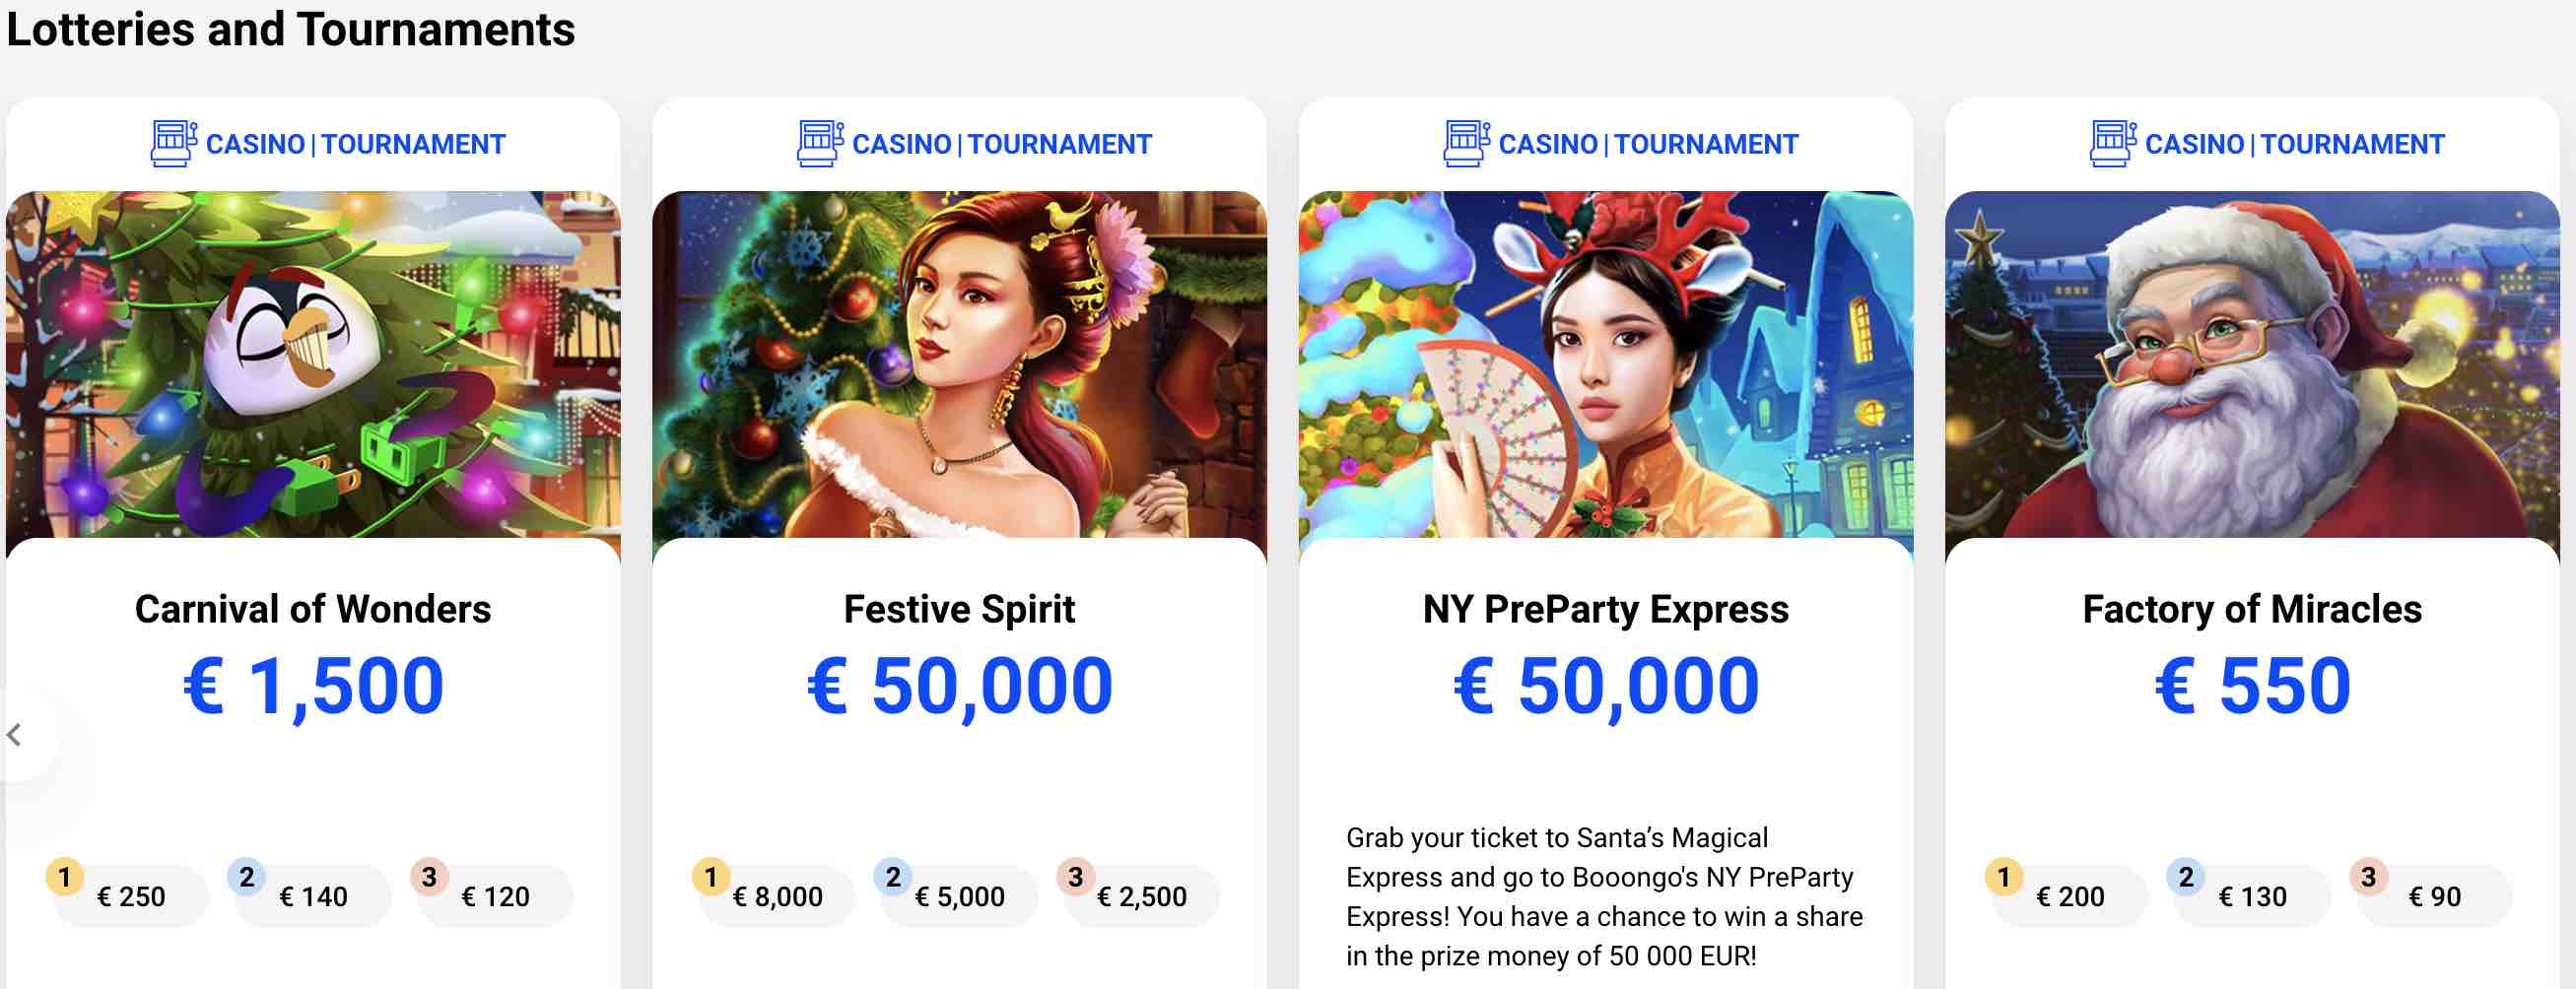 LotteriesTourneys